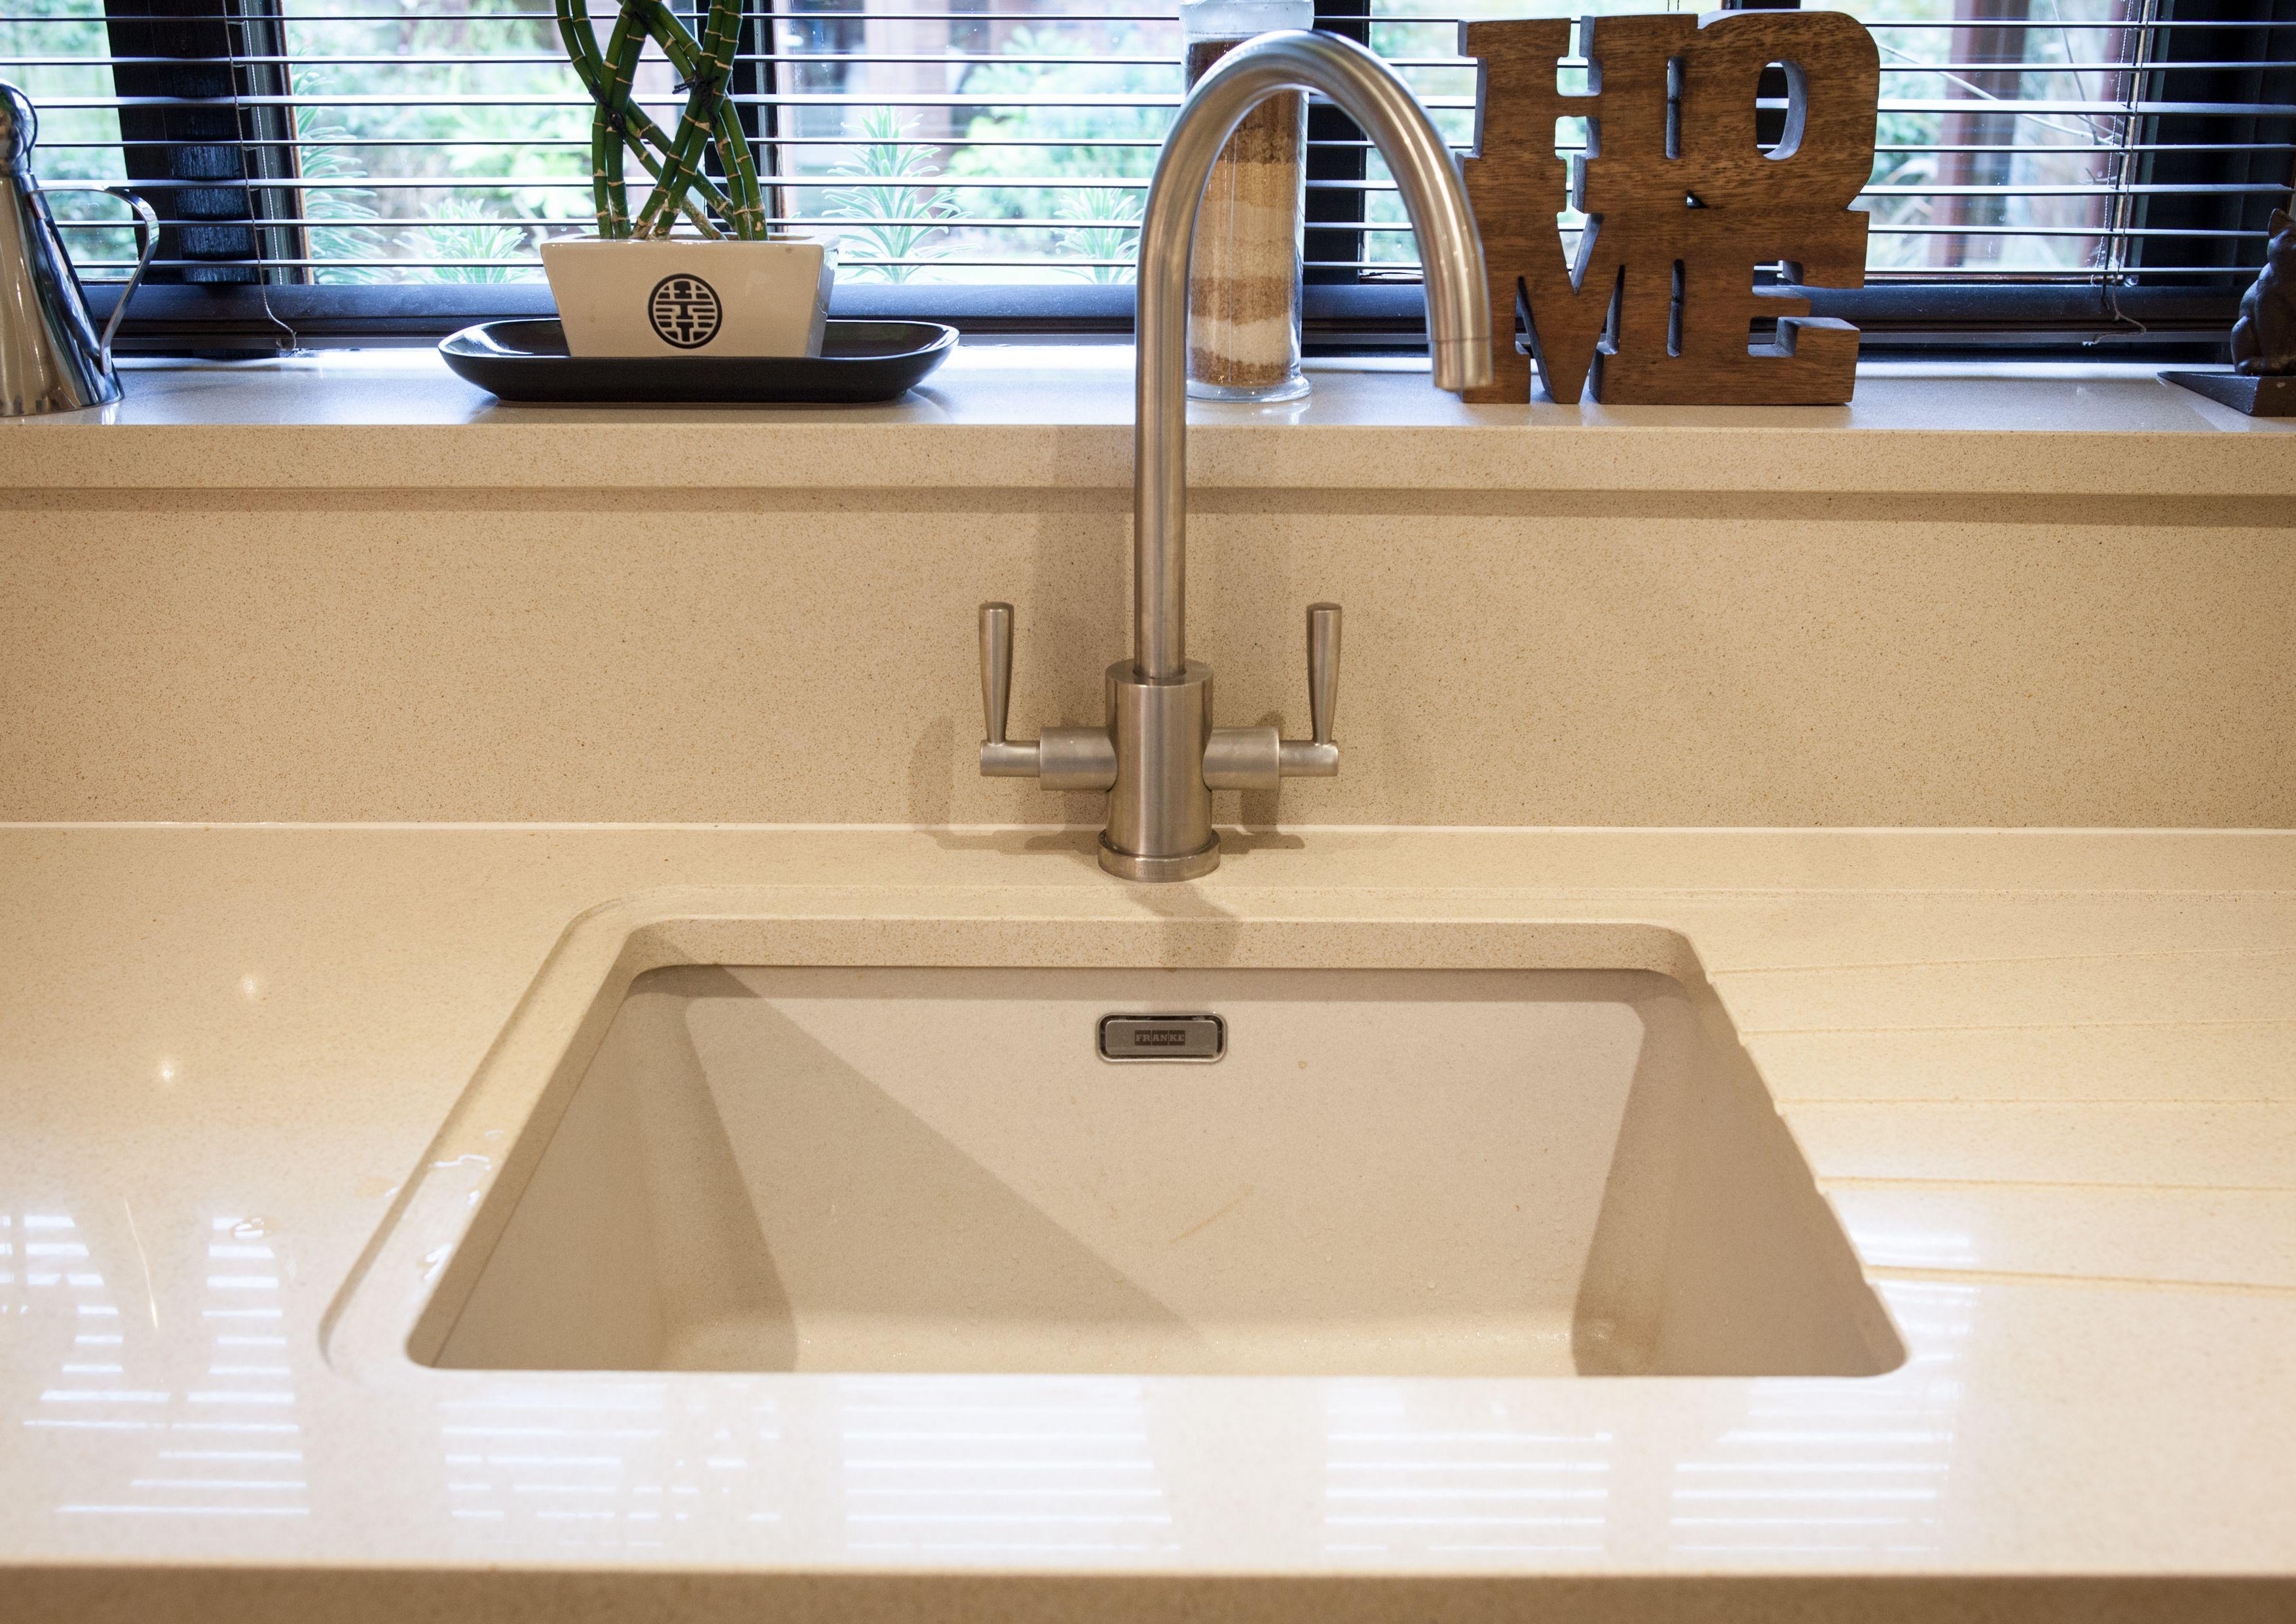 Silestone integrity sink with recess drainer - Kitchen Style Bespoke Oak Shaker With Horizontal Grain Silestone Worktops Tiled Floor Purple Glass Splashbacks Steve And All The Team We Would Like